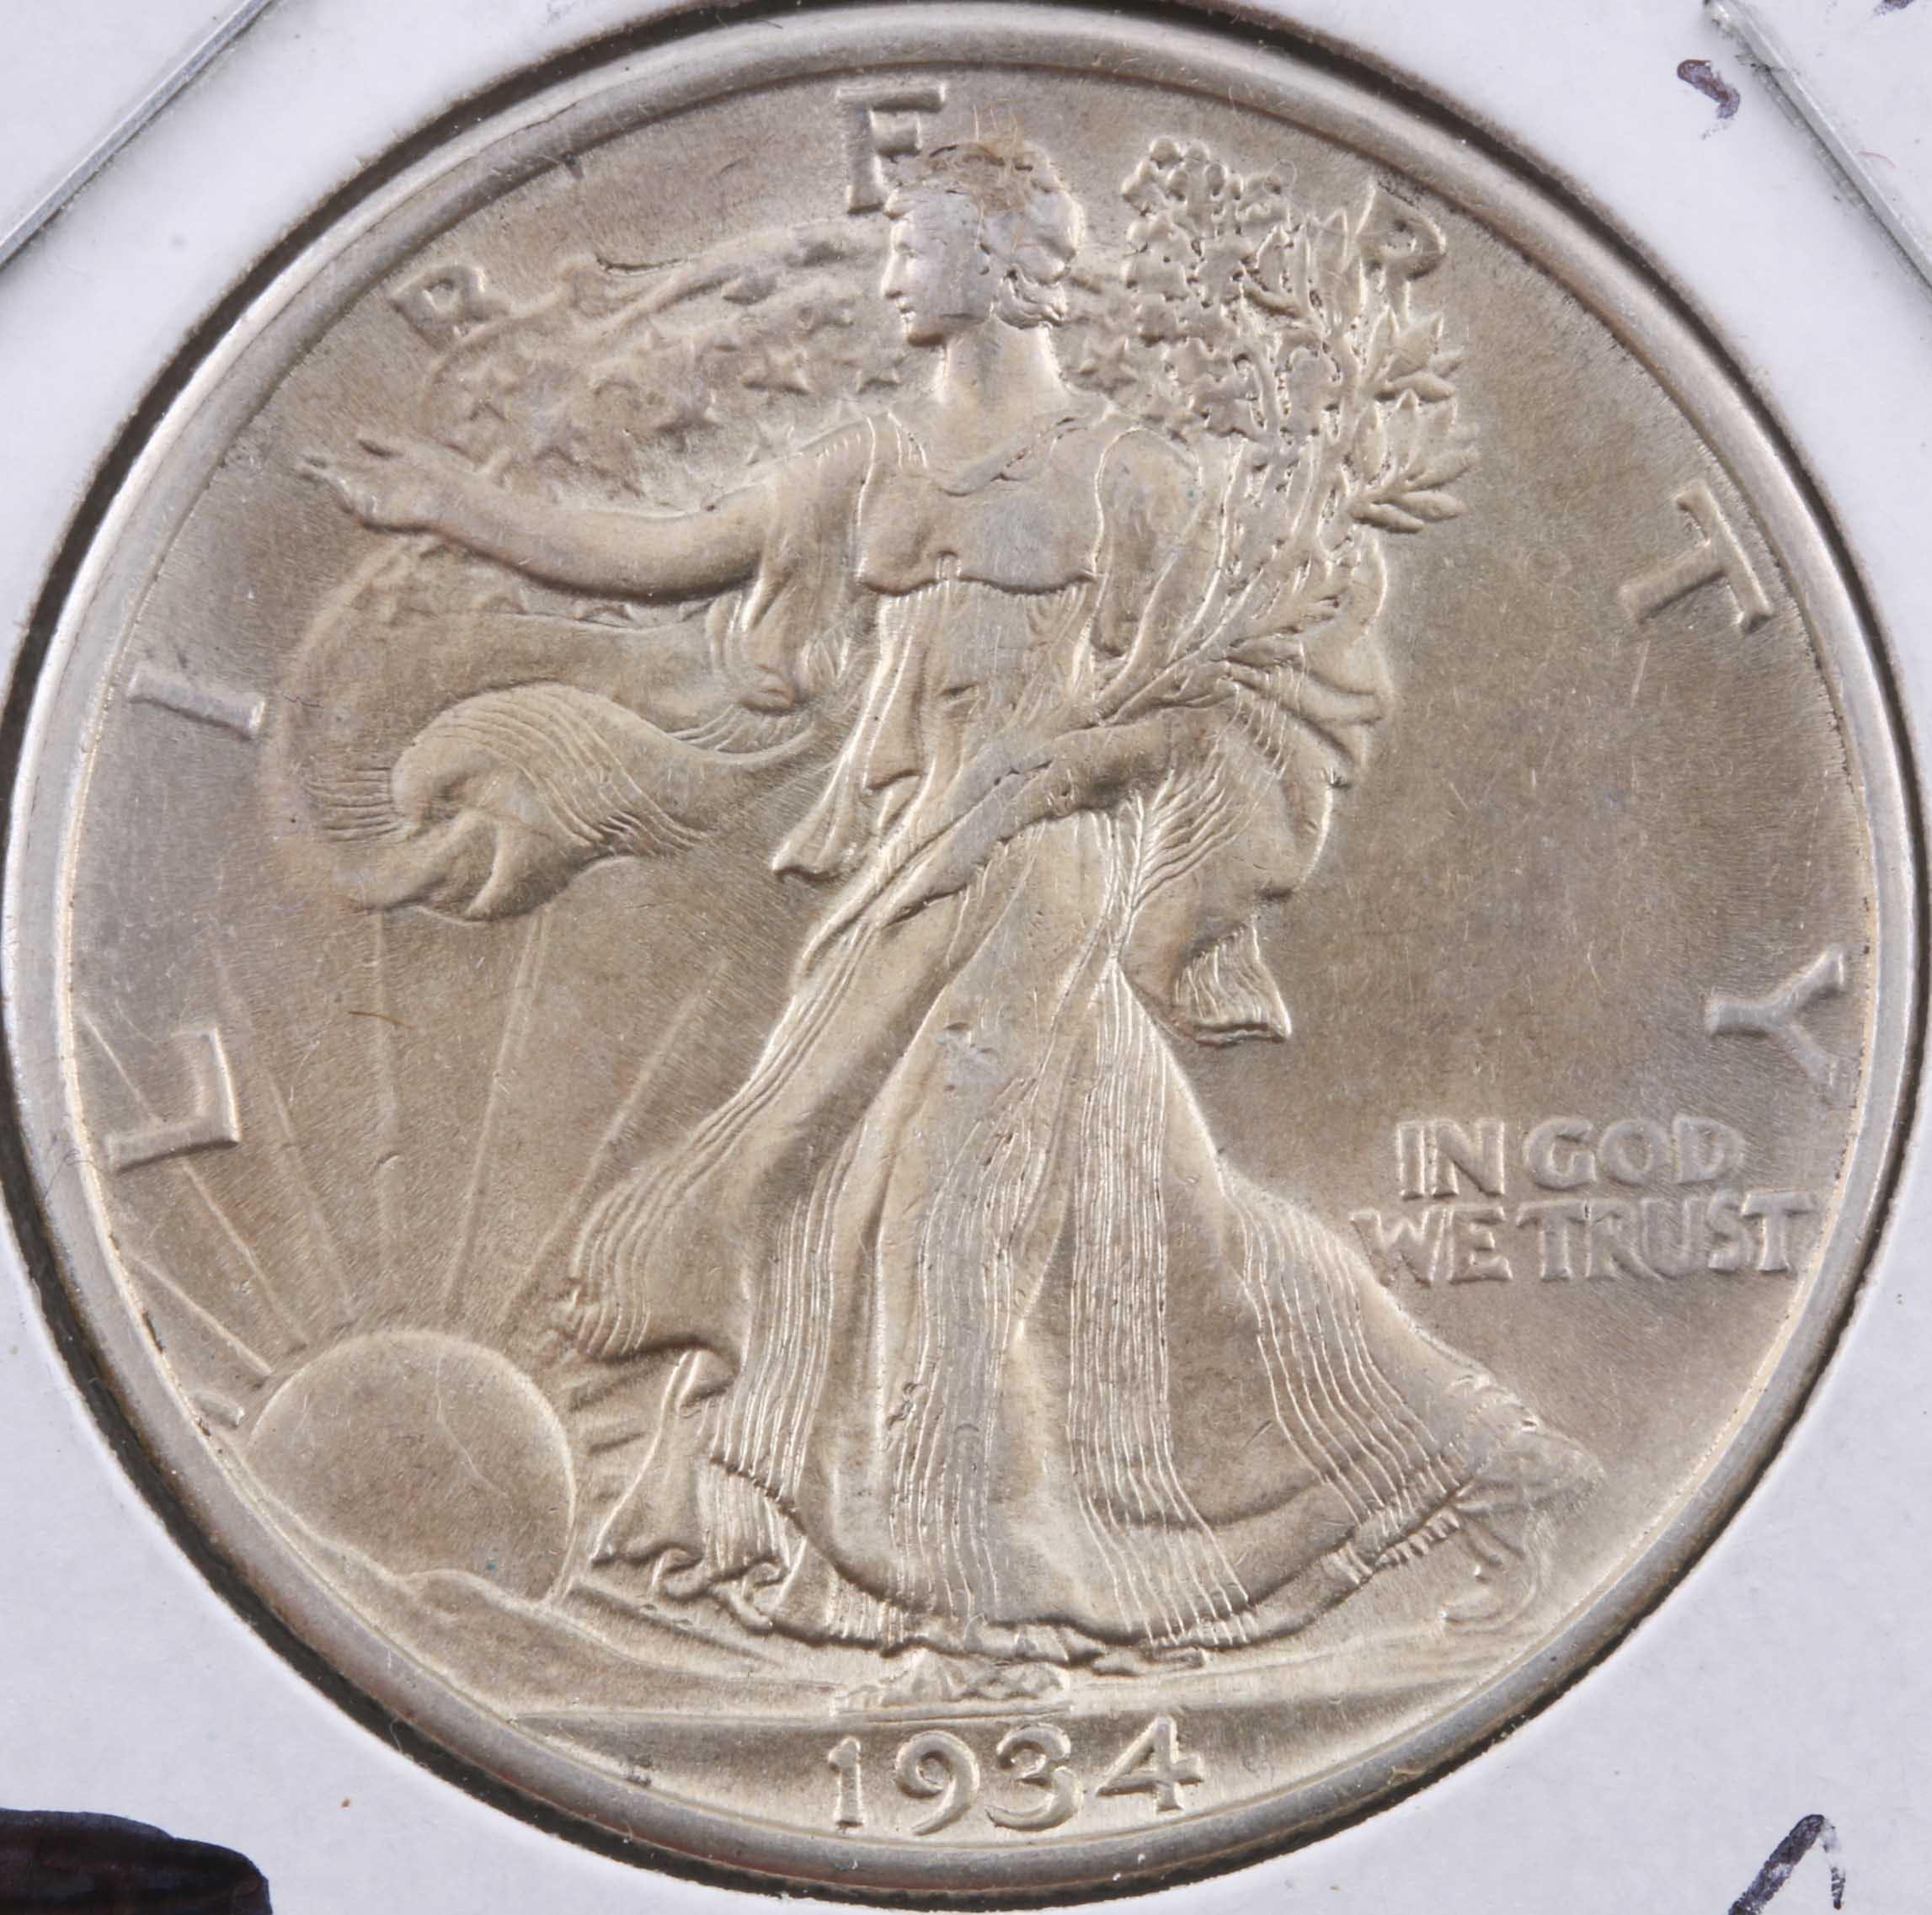 1934 Walking Liberty Silver Half Dollar